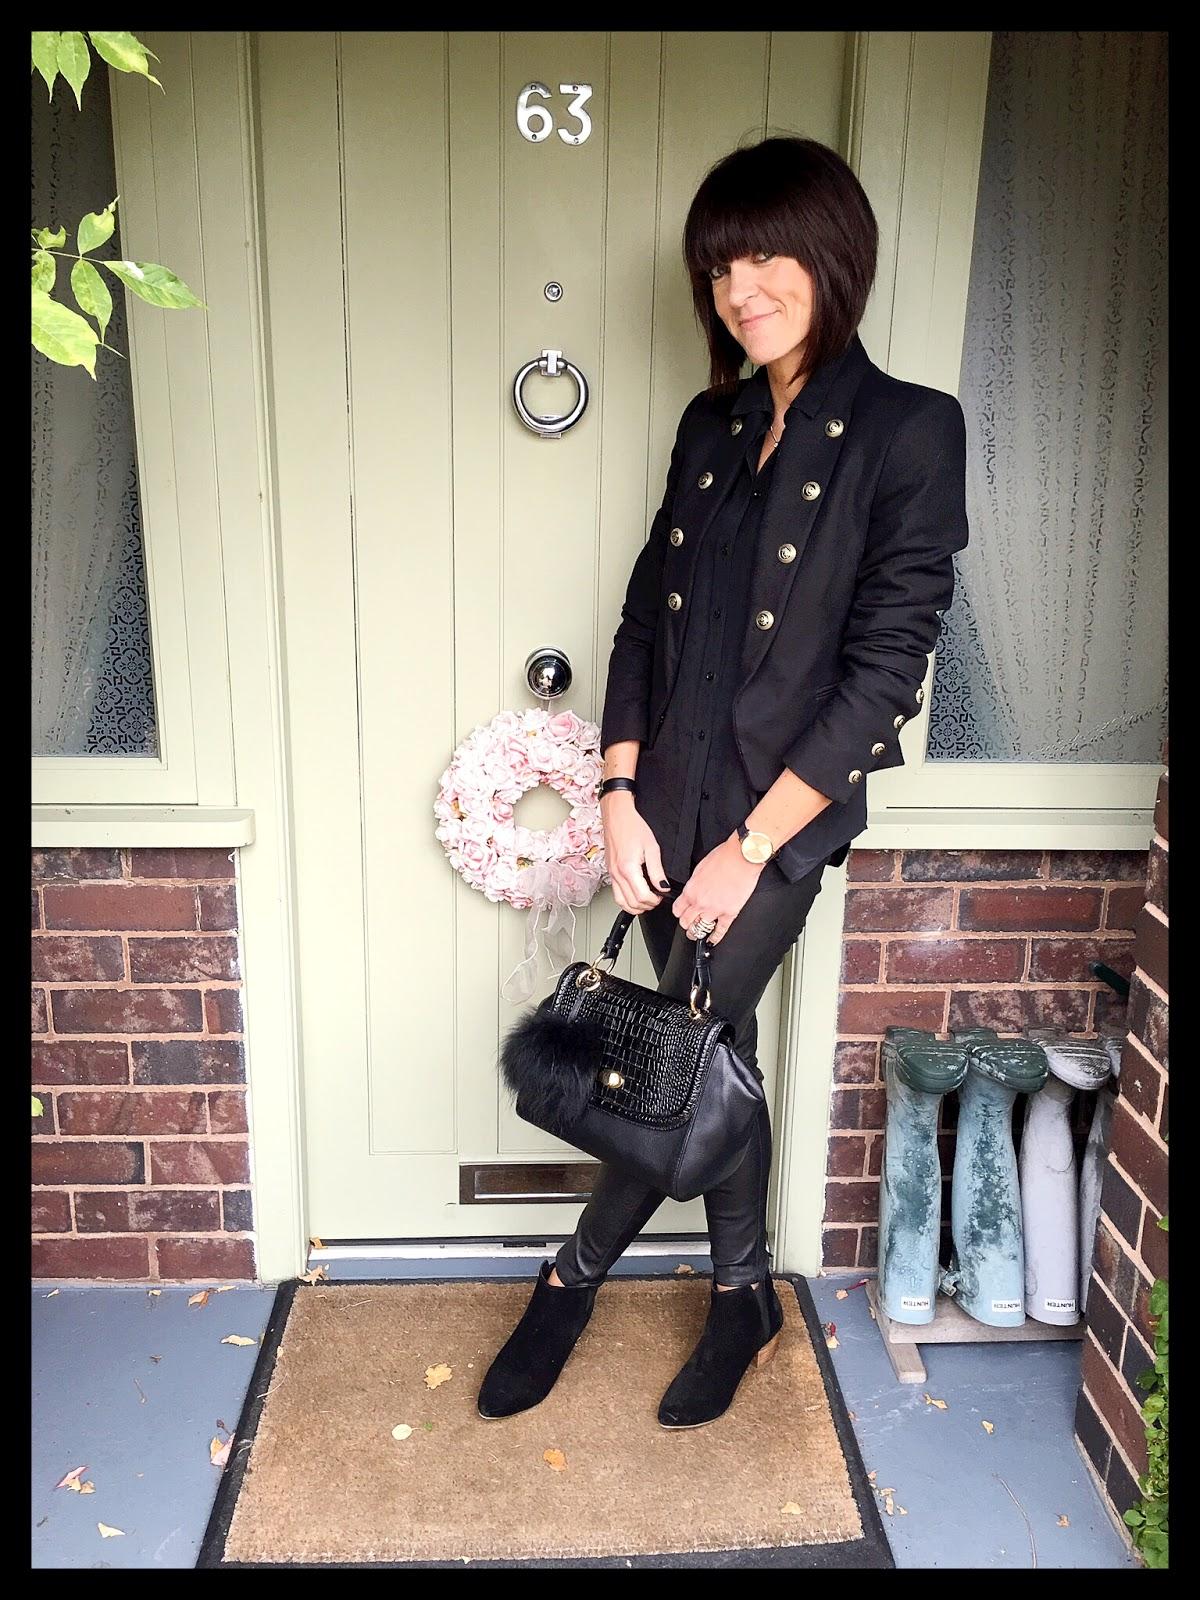 Stealing Kate Winslet 39 S Style My Midlife Fashion Bloglovin